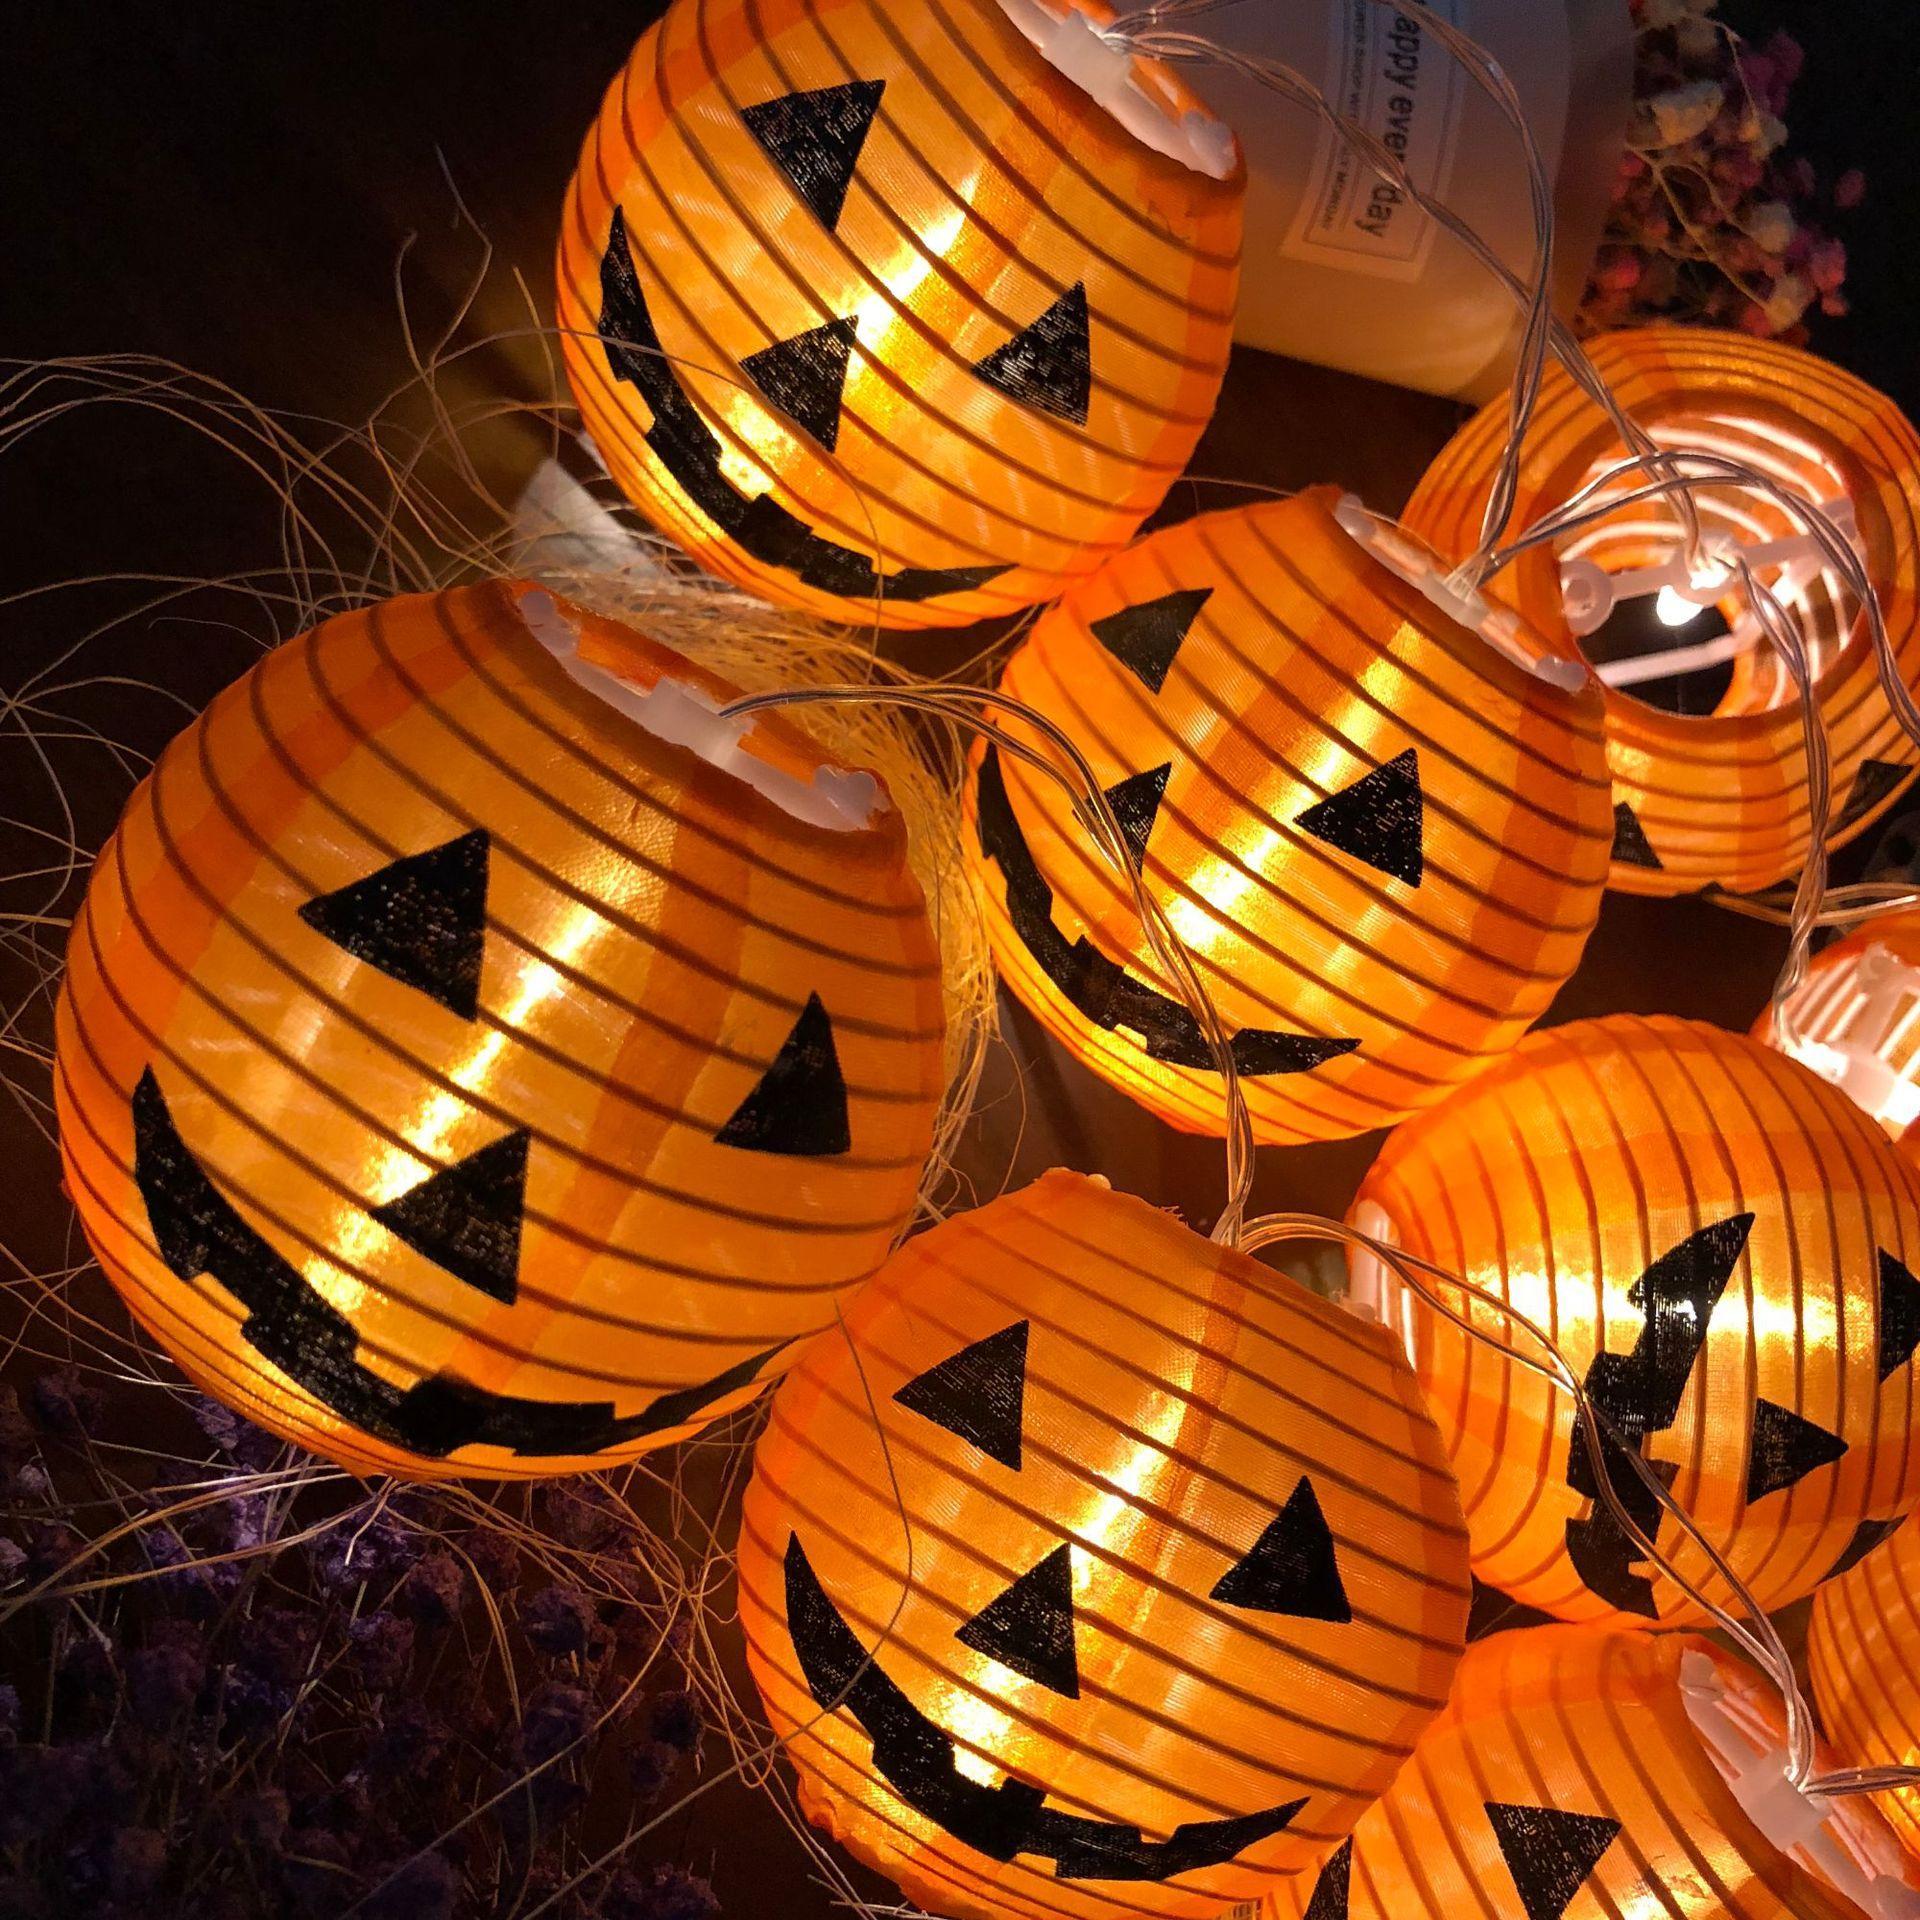 Sporting 10 Led String Light Pumpkin Lights Skull Halloween Decoration Fairy Lights Party Prop Lanterns Festival Event Garden Colorful Lights & Lighting